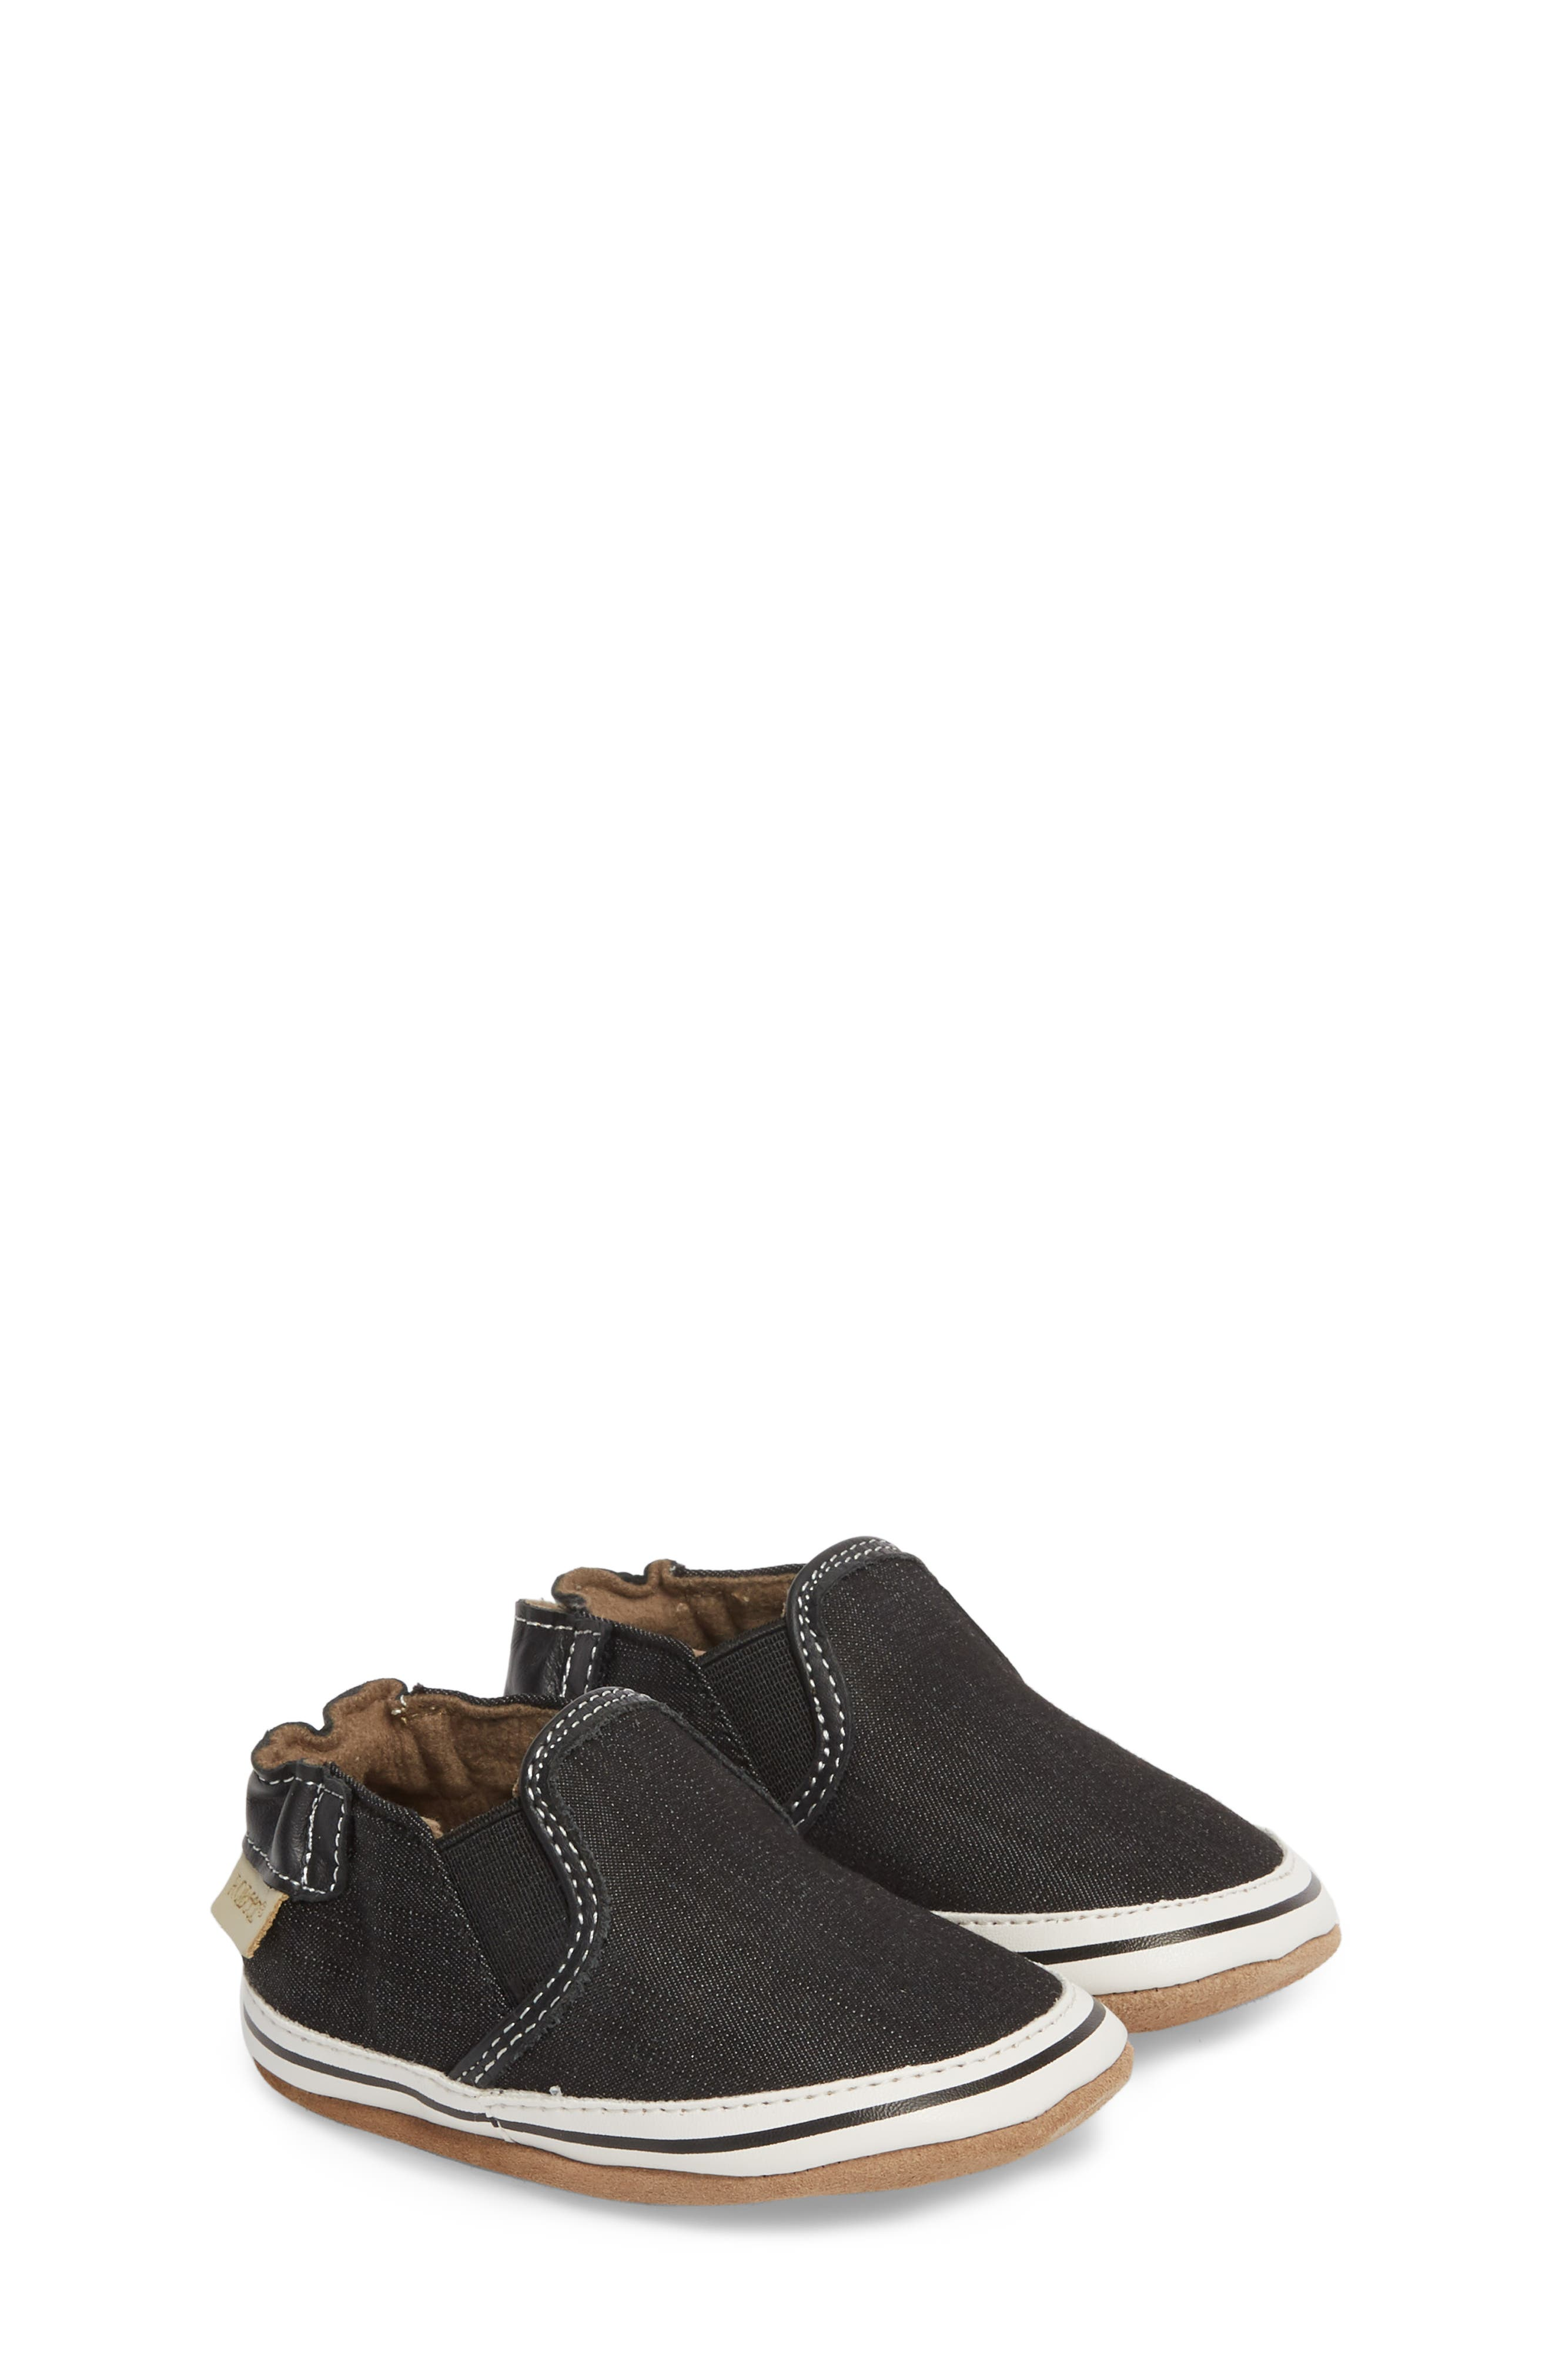 ROBEEZ<SUP>®</SUP>, Liam Slip-On Crib Sneaker, Main thumbnail 1, color, BLACK